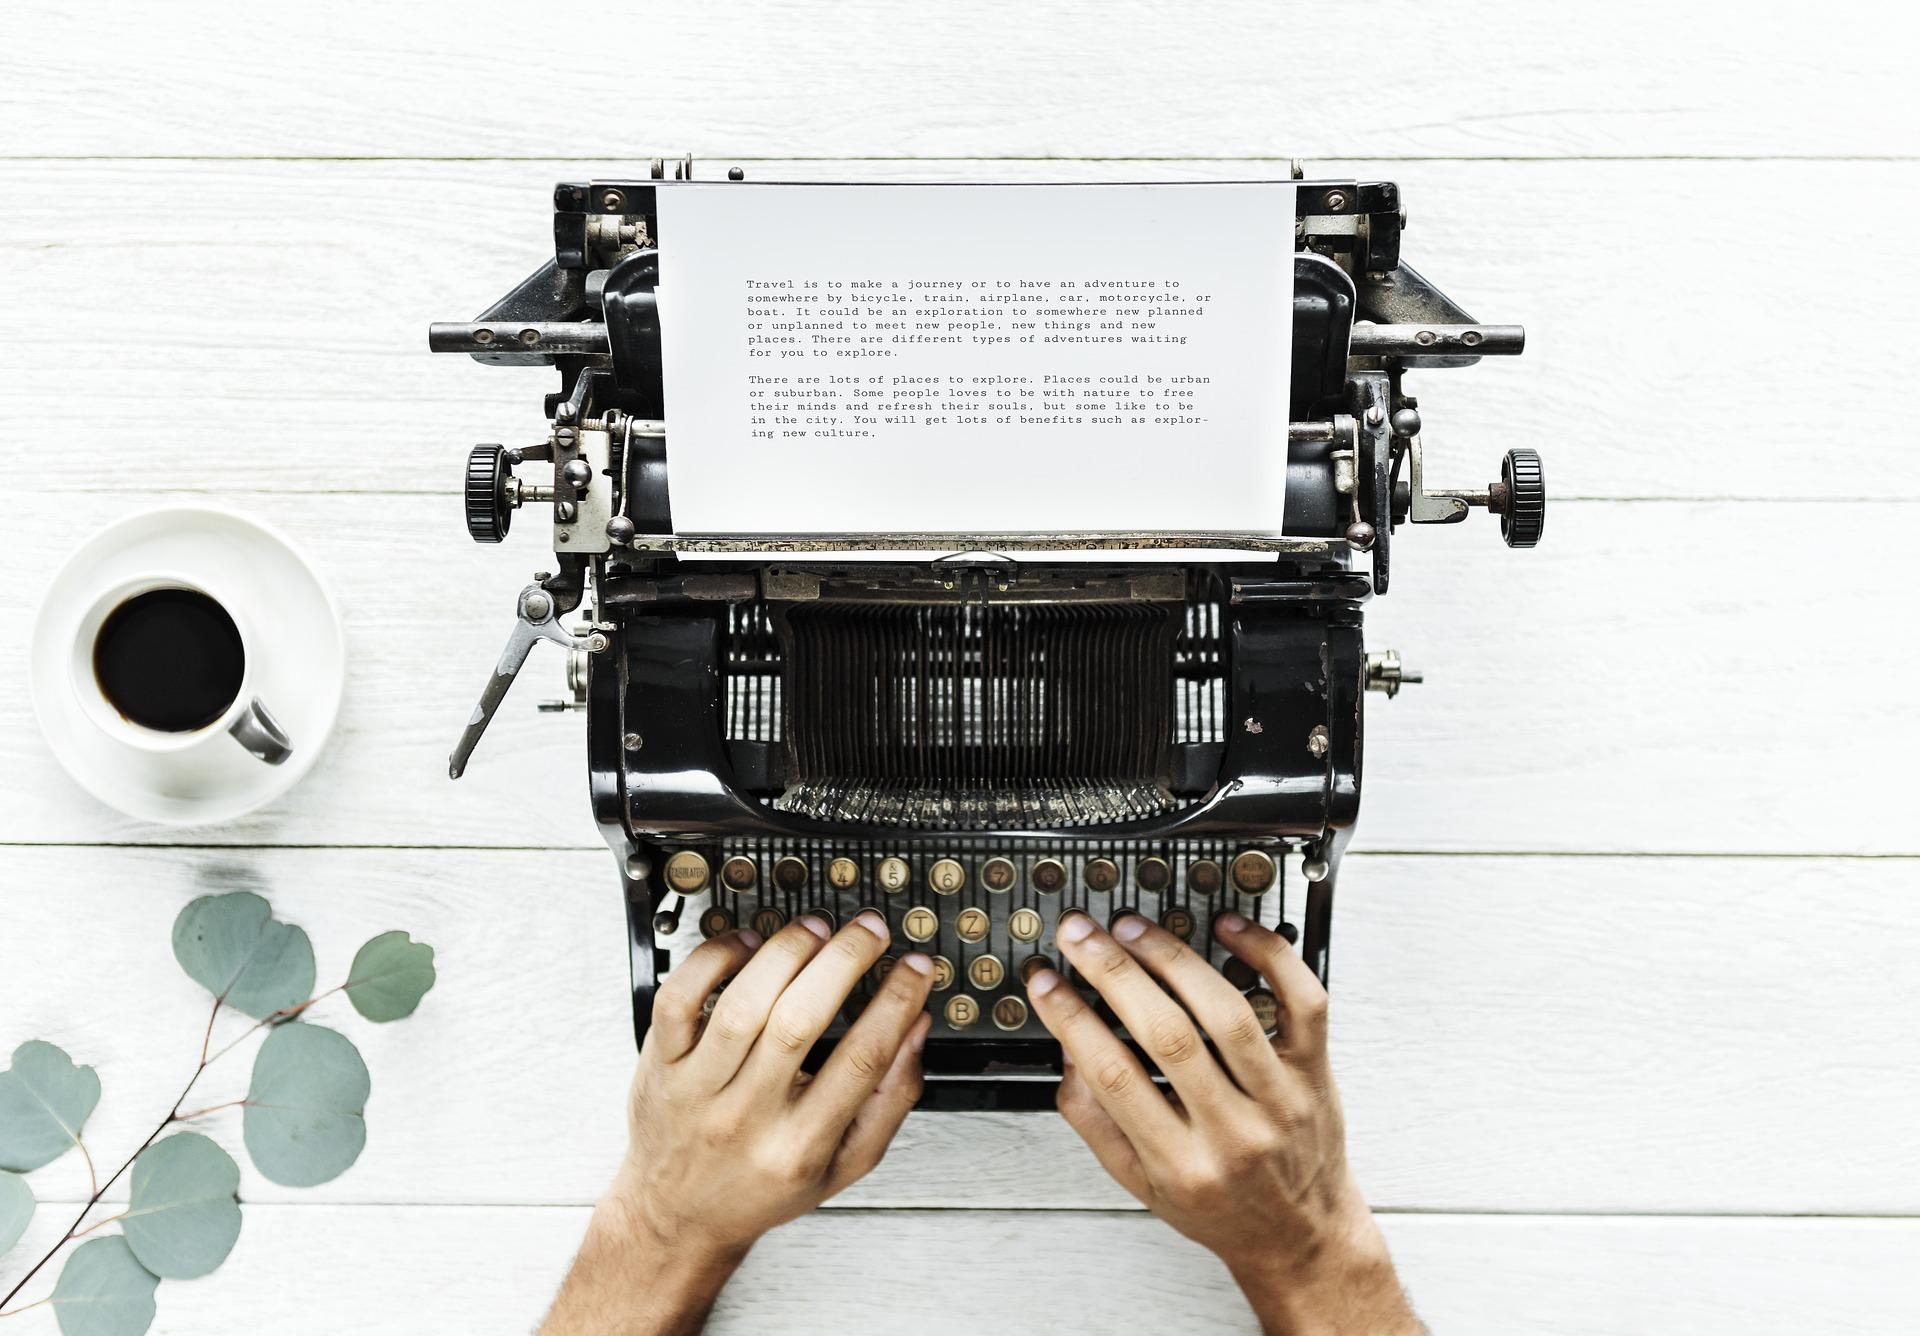 typewriter - winter 2019 screenwriting contest